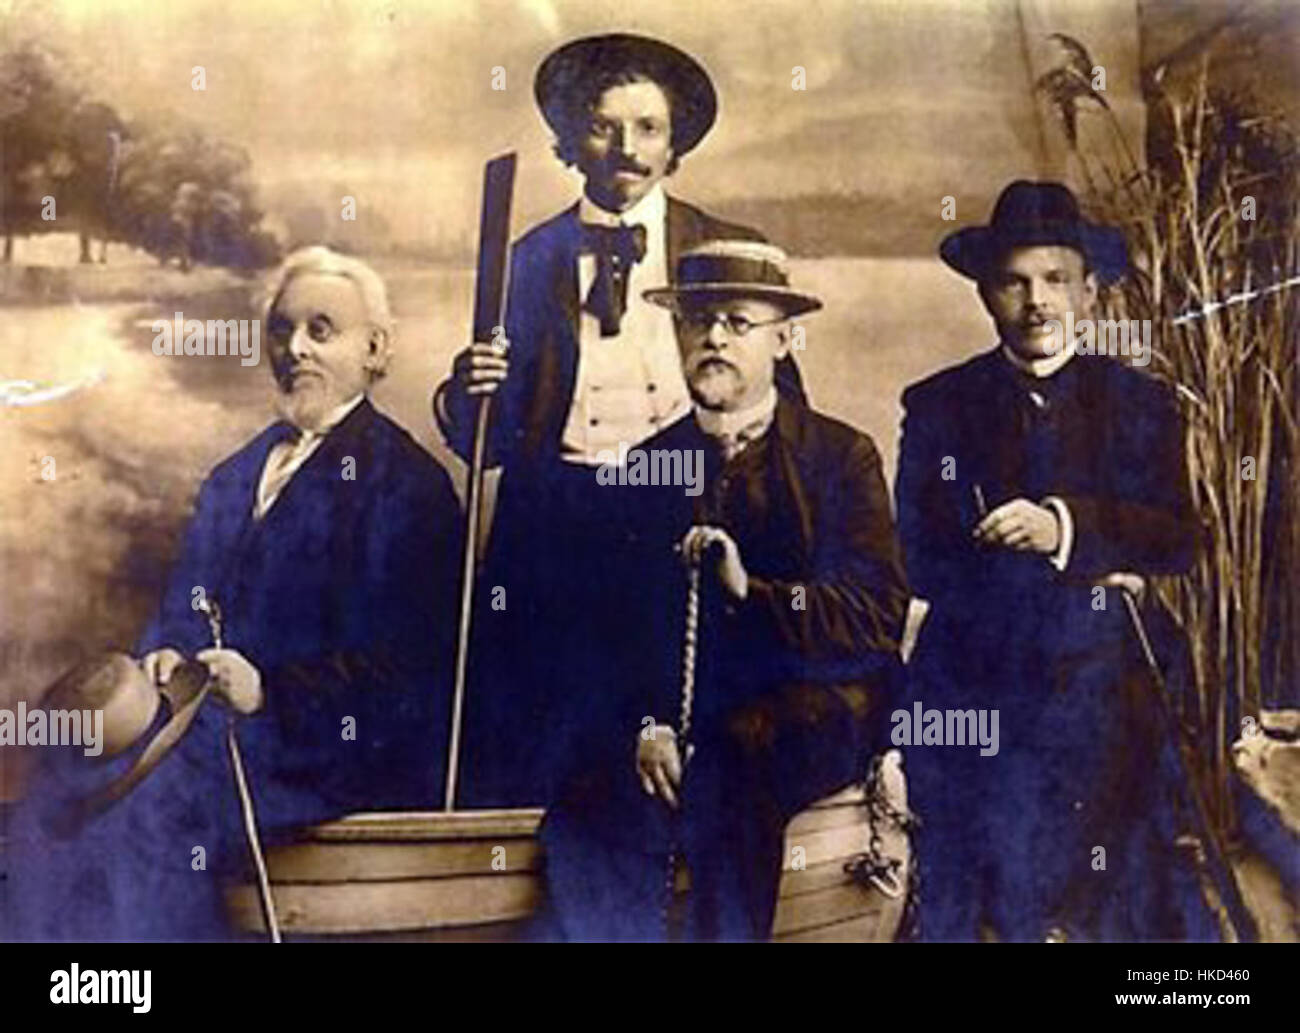 Mendele Mos Sholem Aleichem Ben Ami Bialik Odessa 1910 - Stock Image